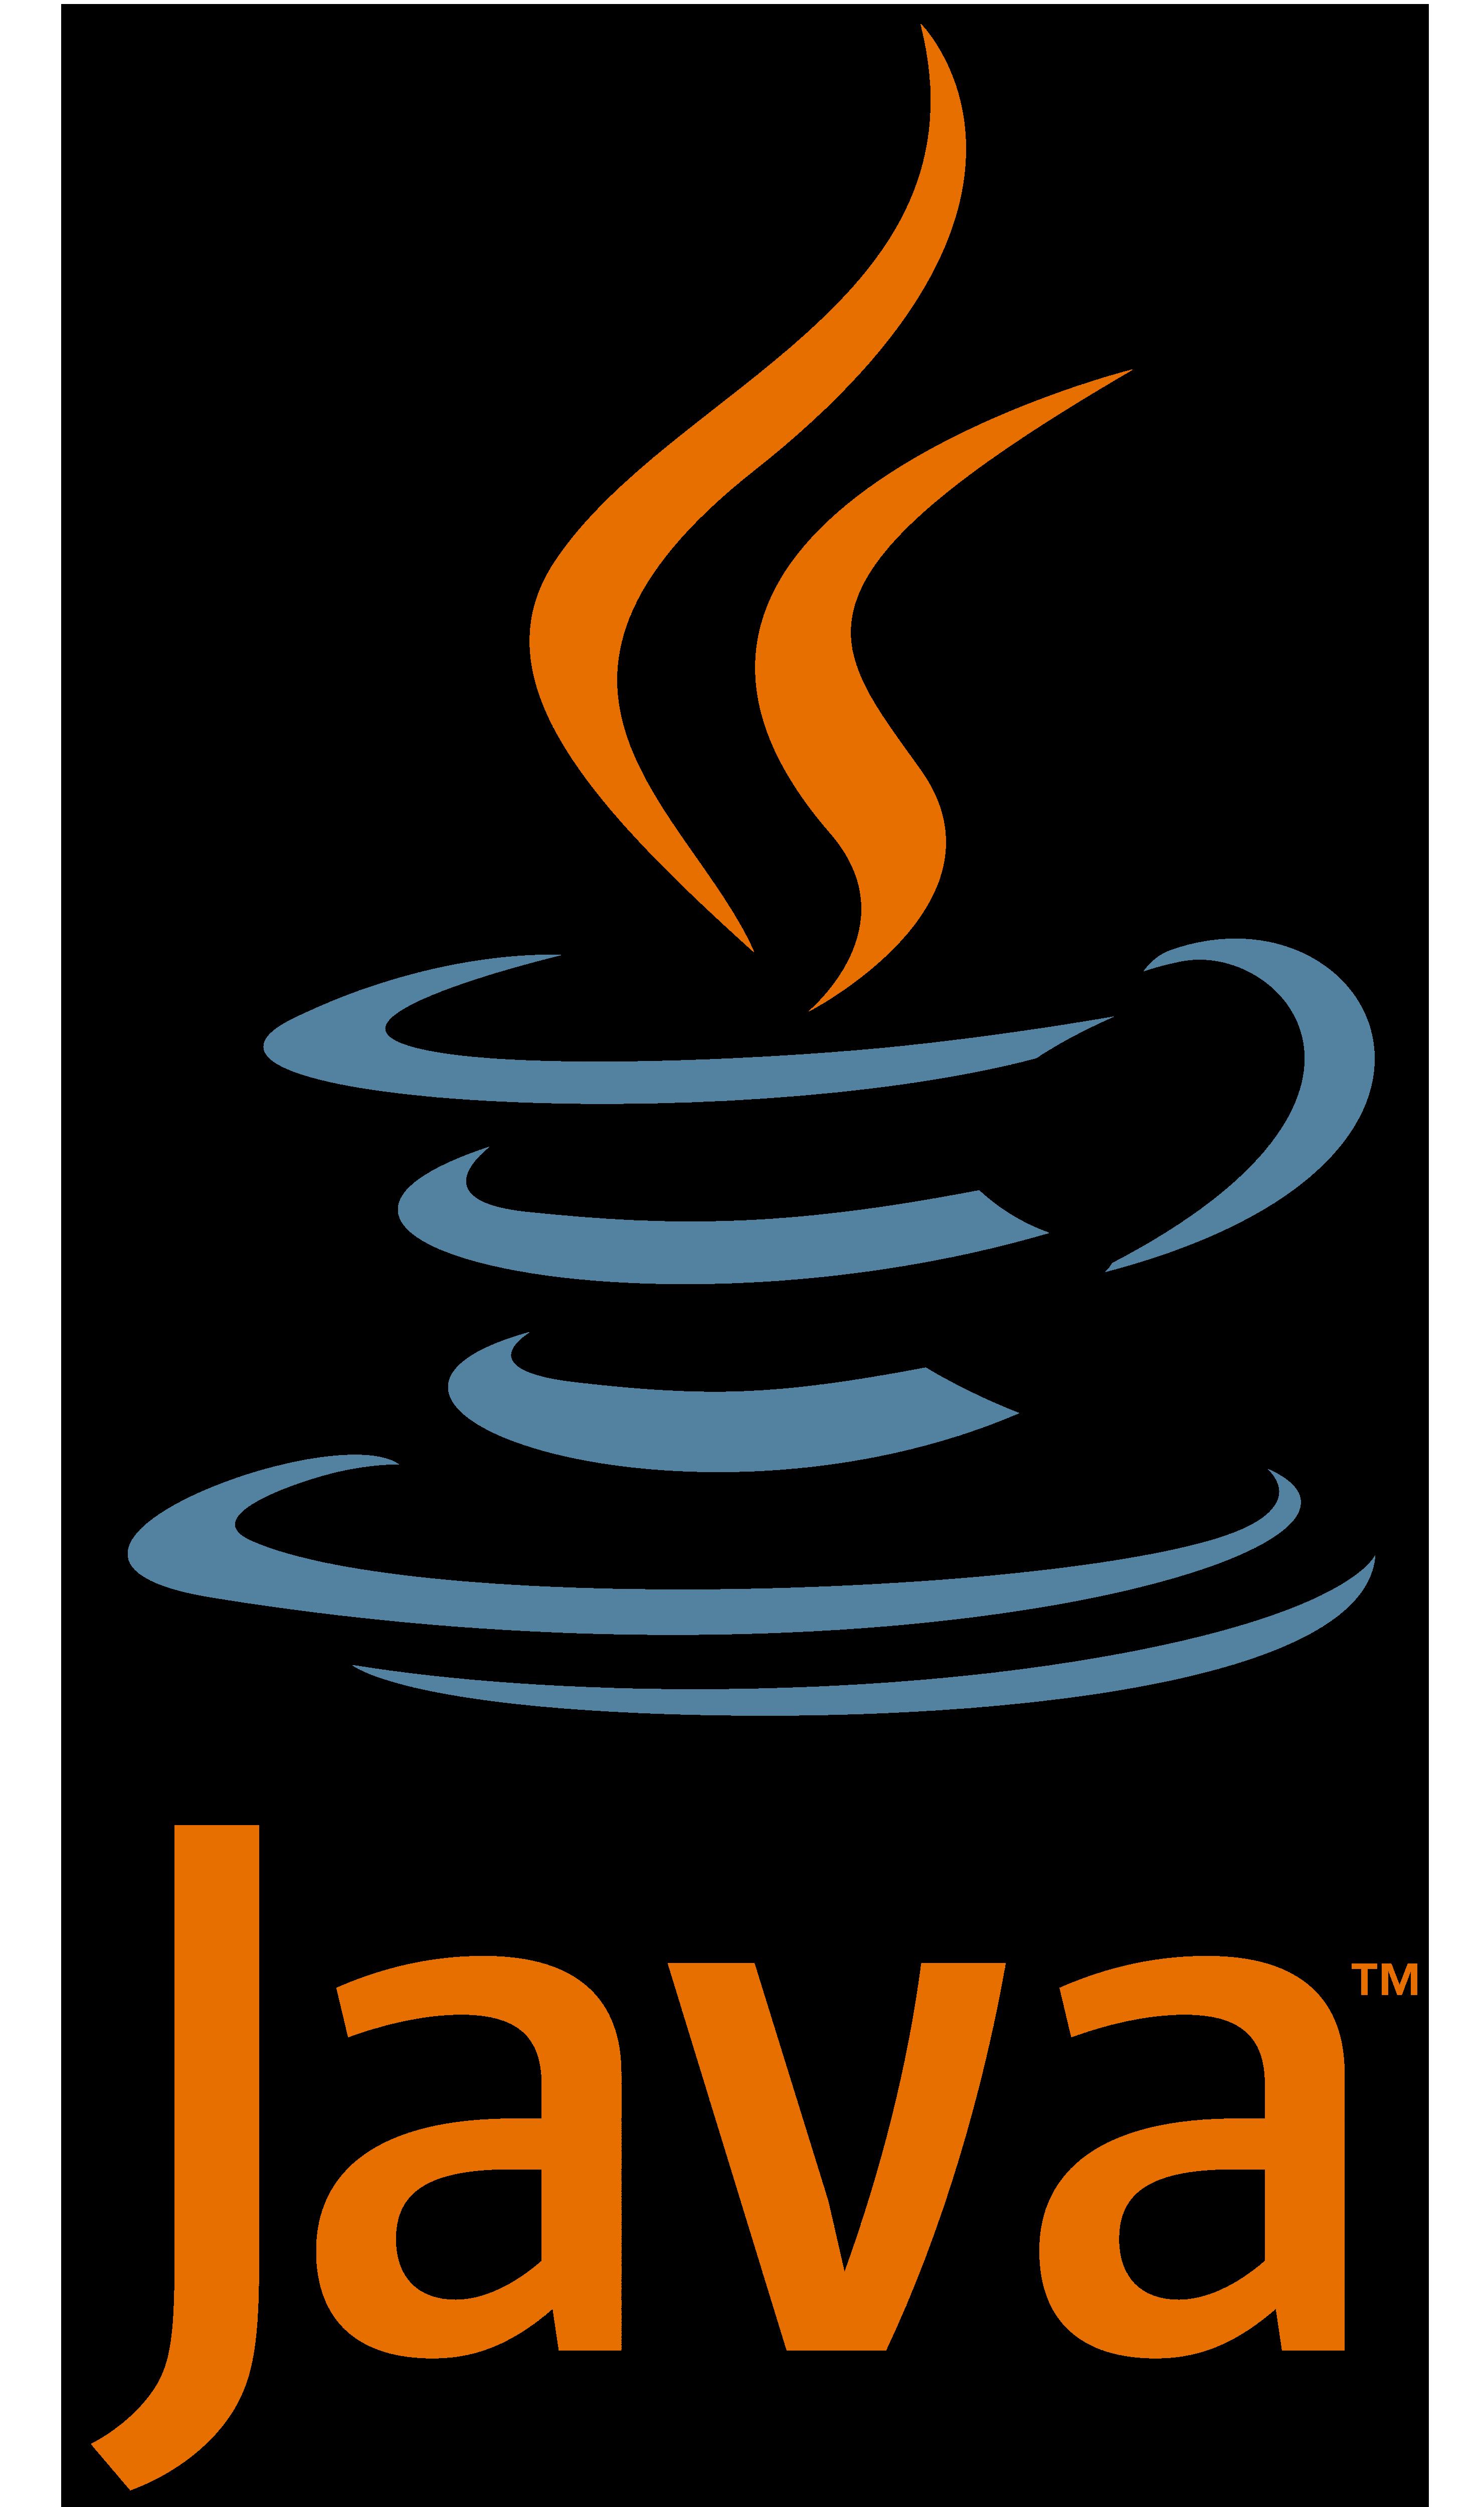 JMX (Java)